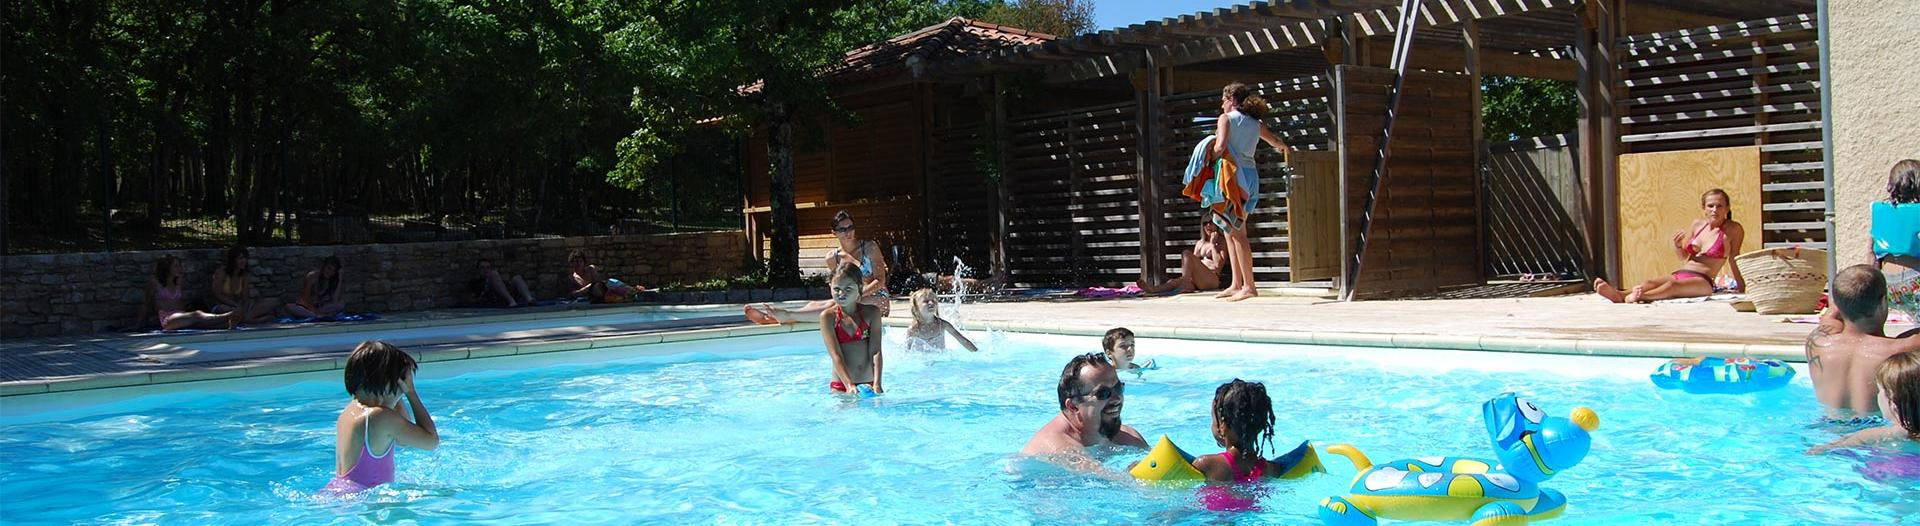 slider-camping-segalieres-piscine